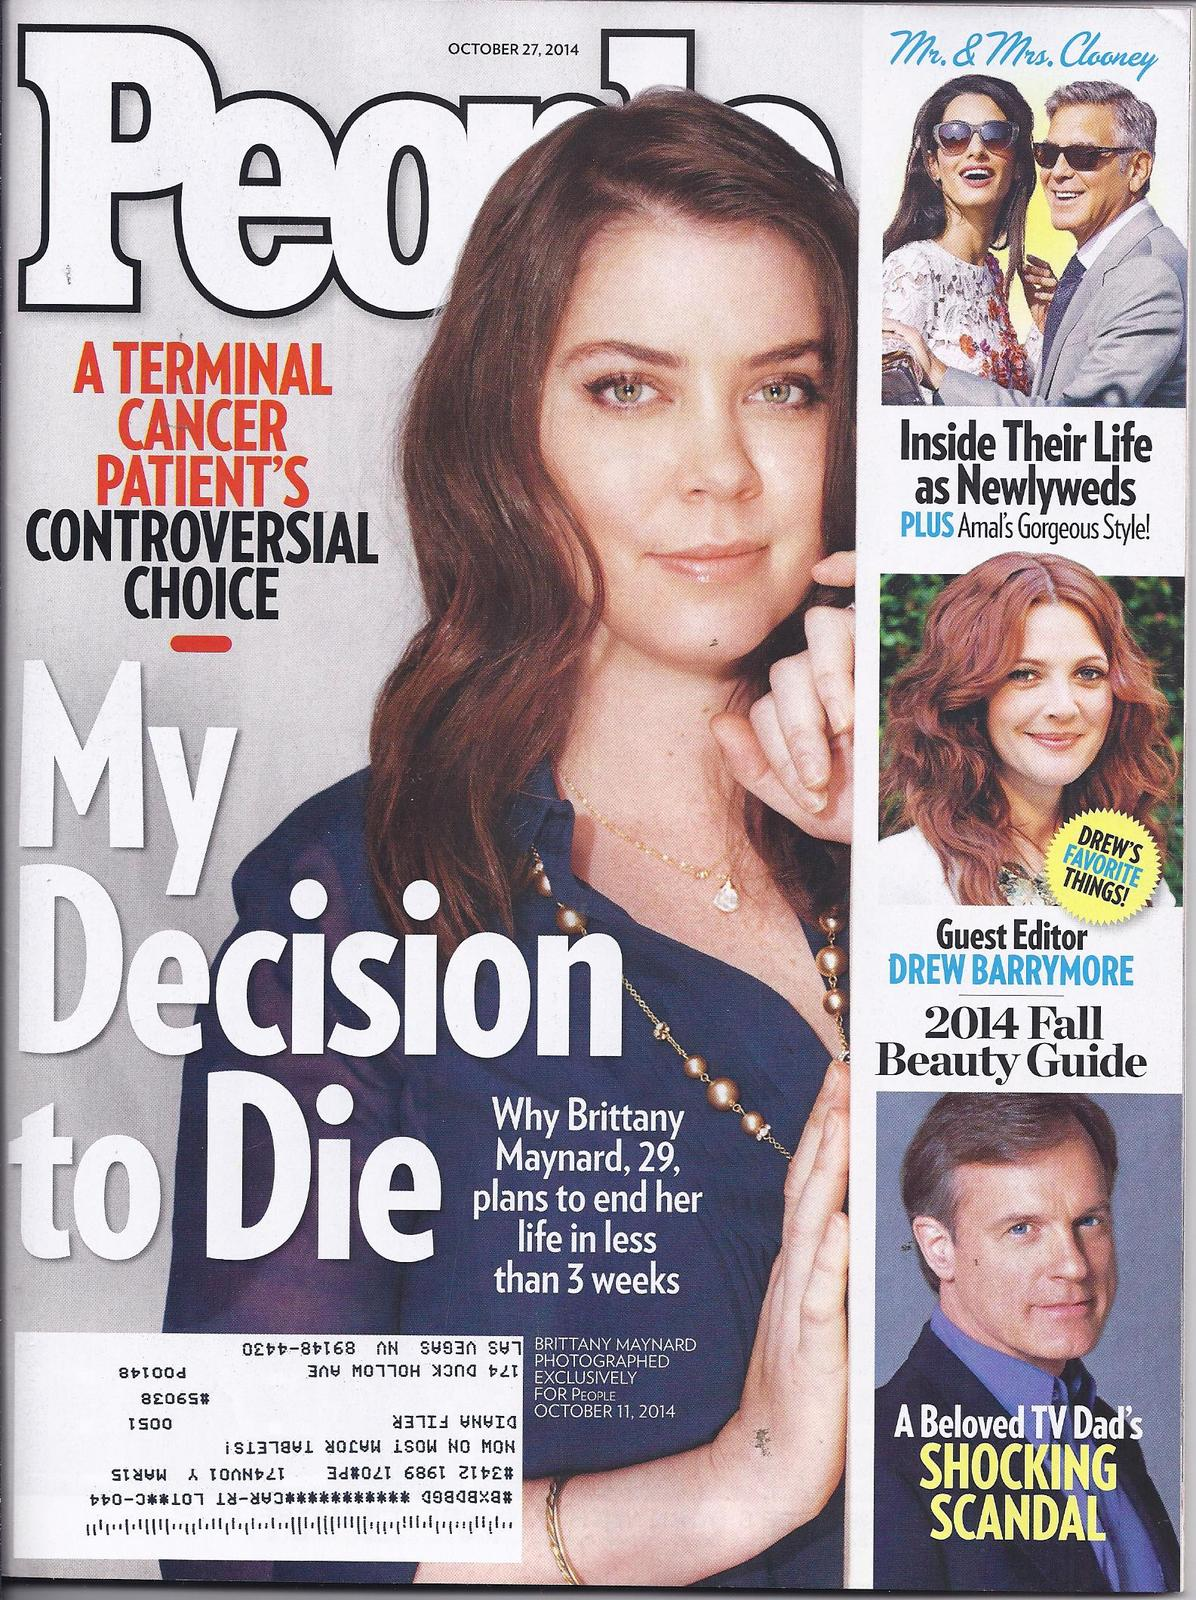 BRITTANY MAYNARD, 29 Plans to Die @ People Magazine Oct  27, 2014 - $2.95